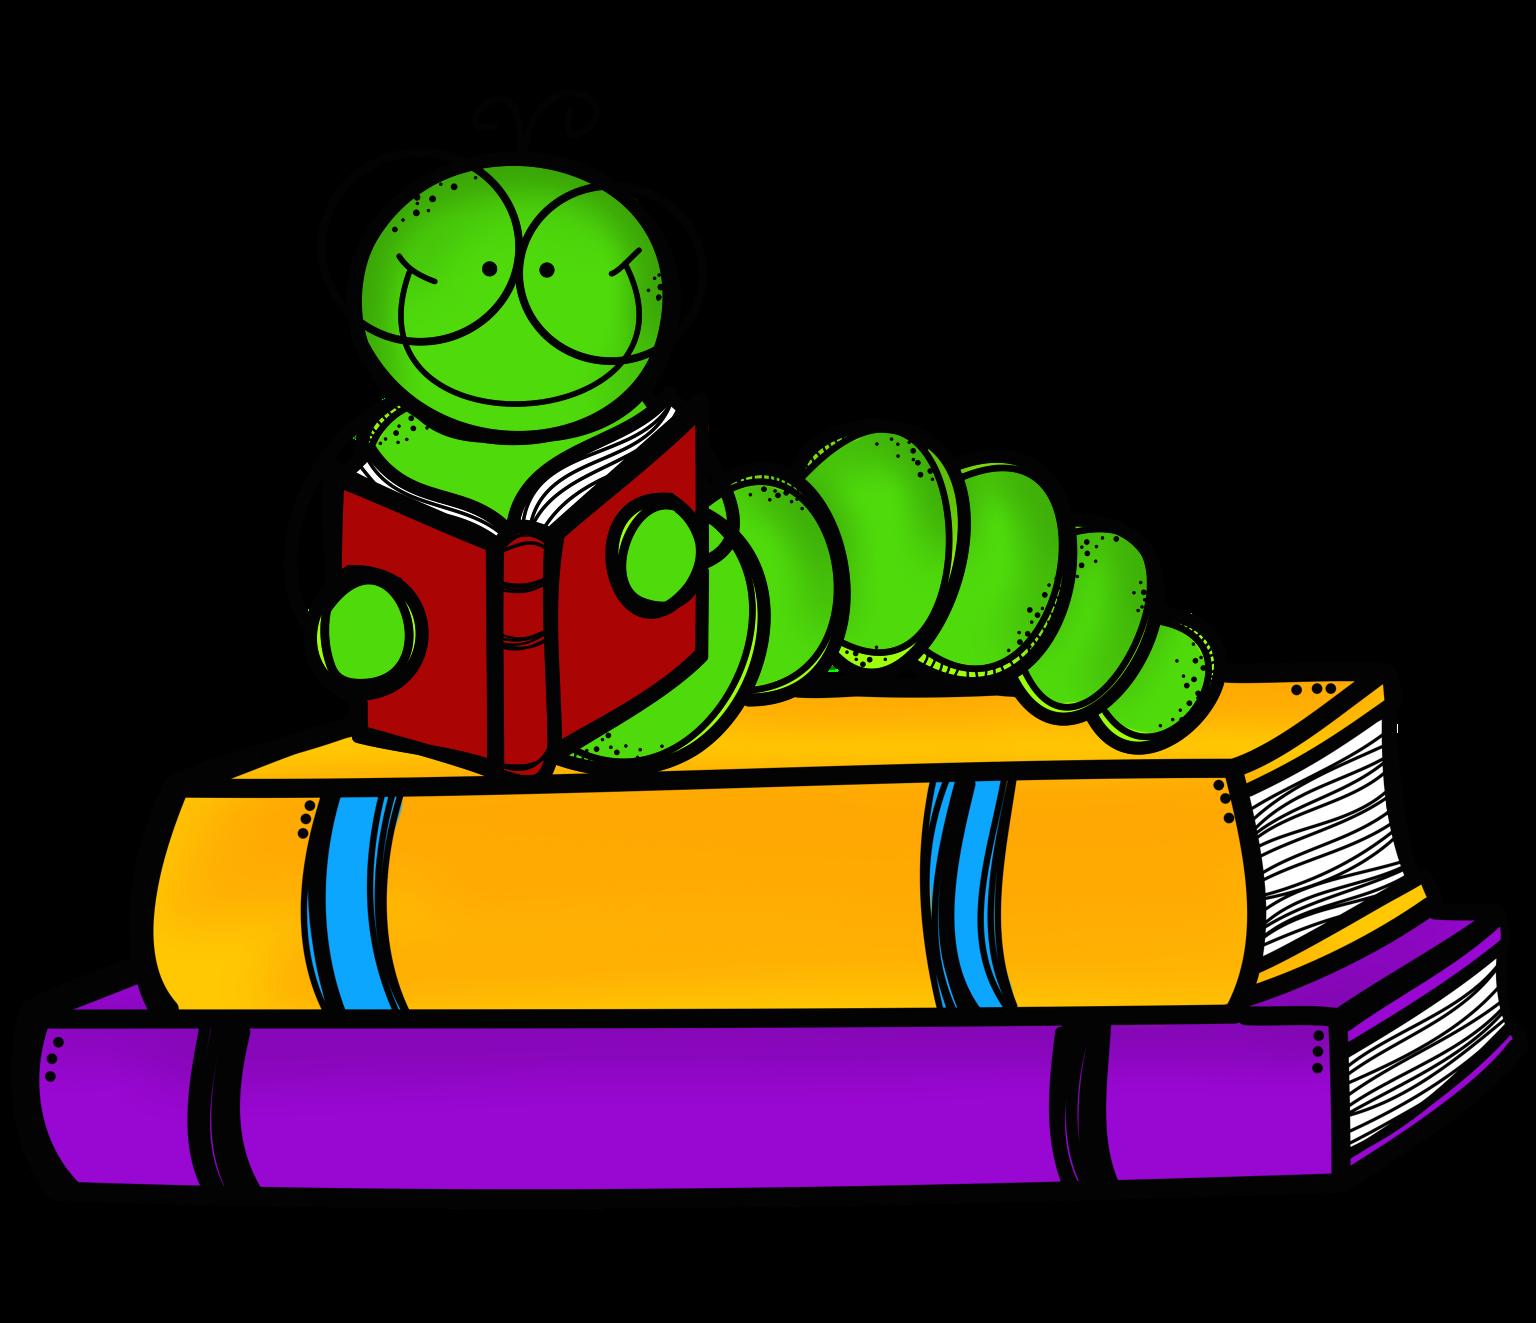 Class clipart librarian, Class librarian Transparent FREE.